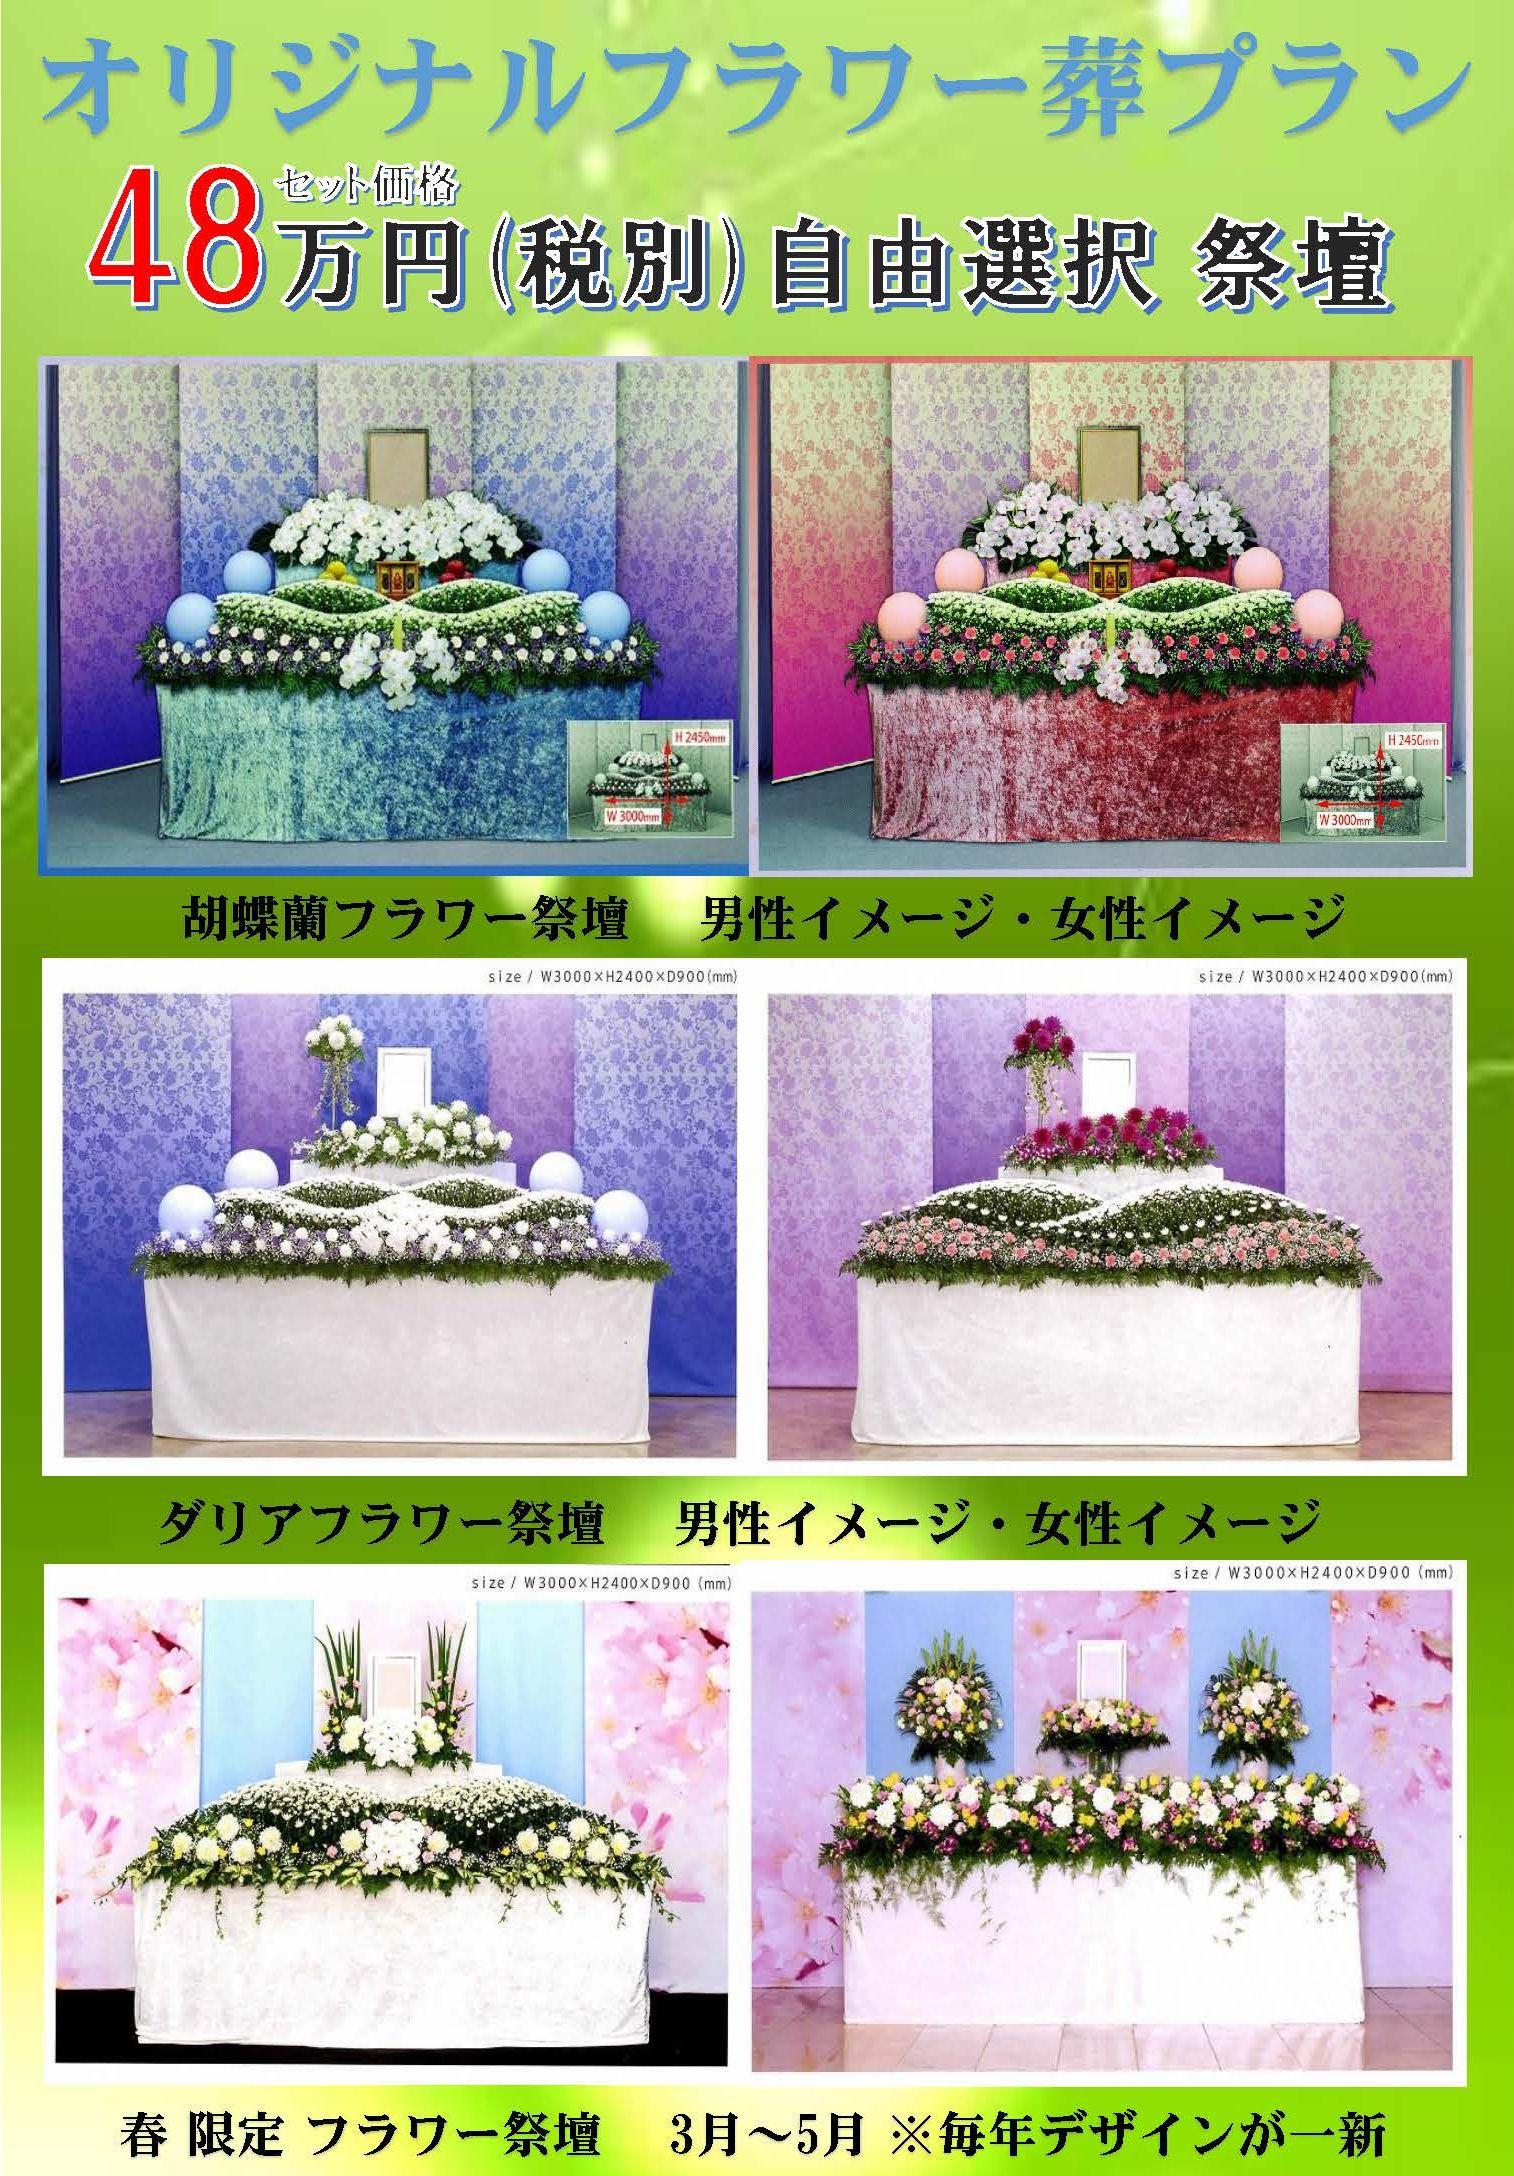 自由選択祭壇48万円_ページ_1